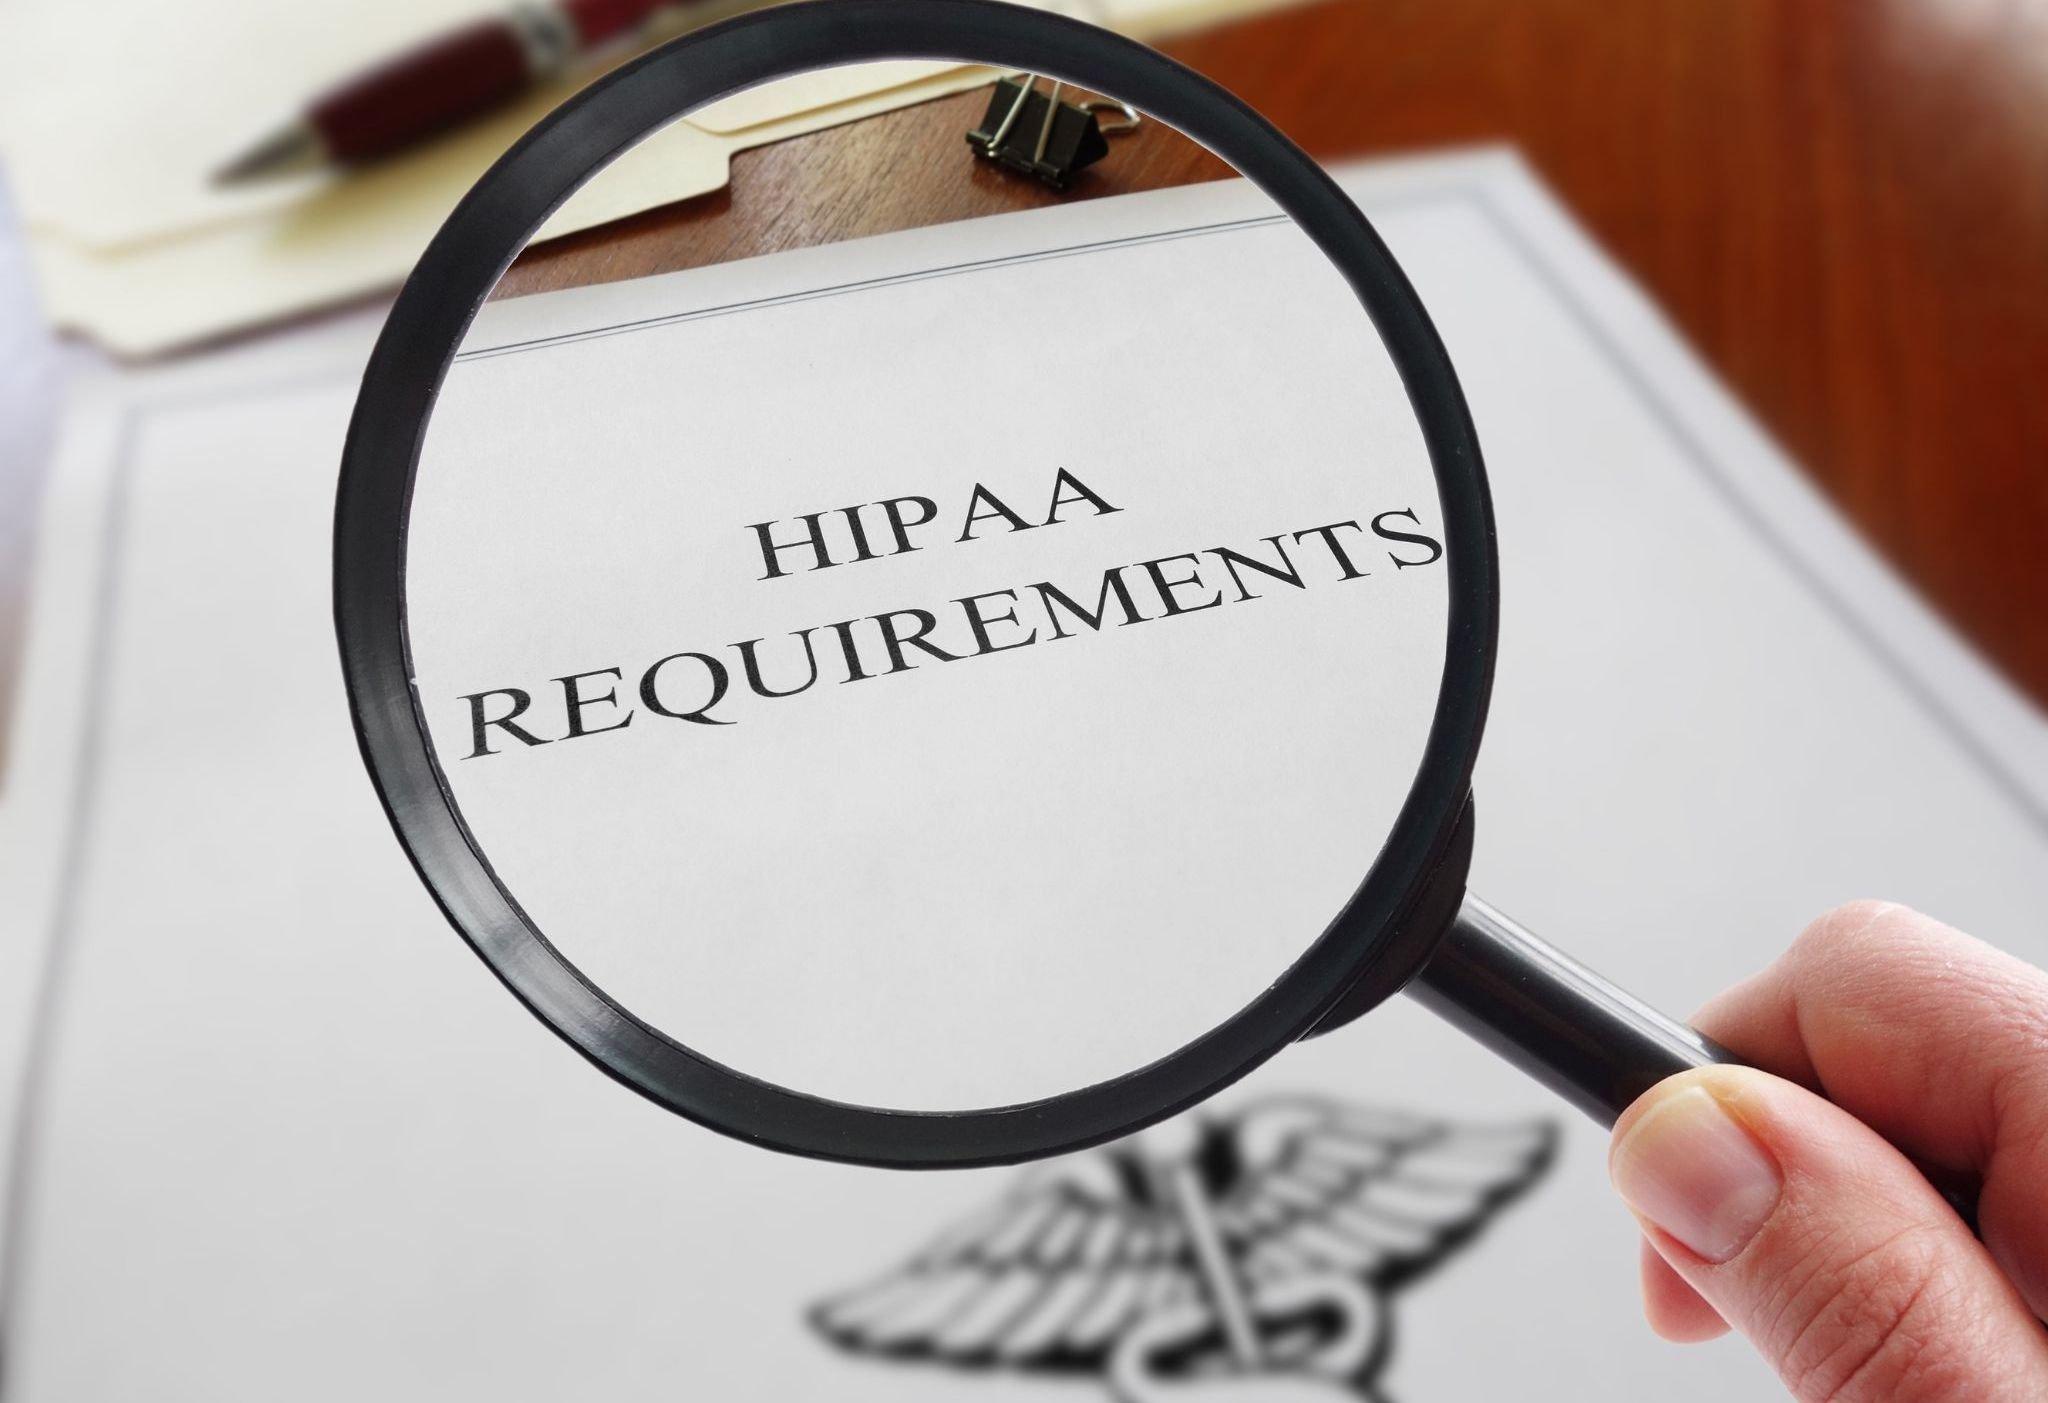 HIPAA requirements